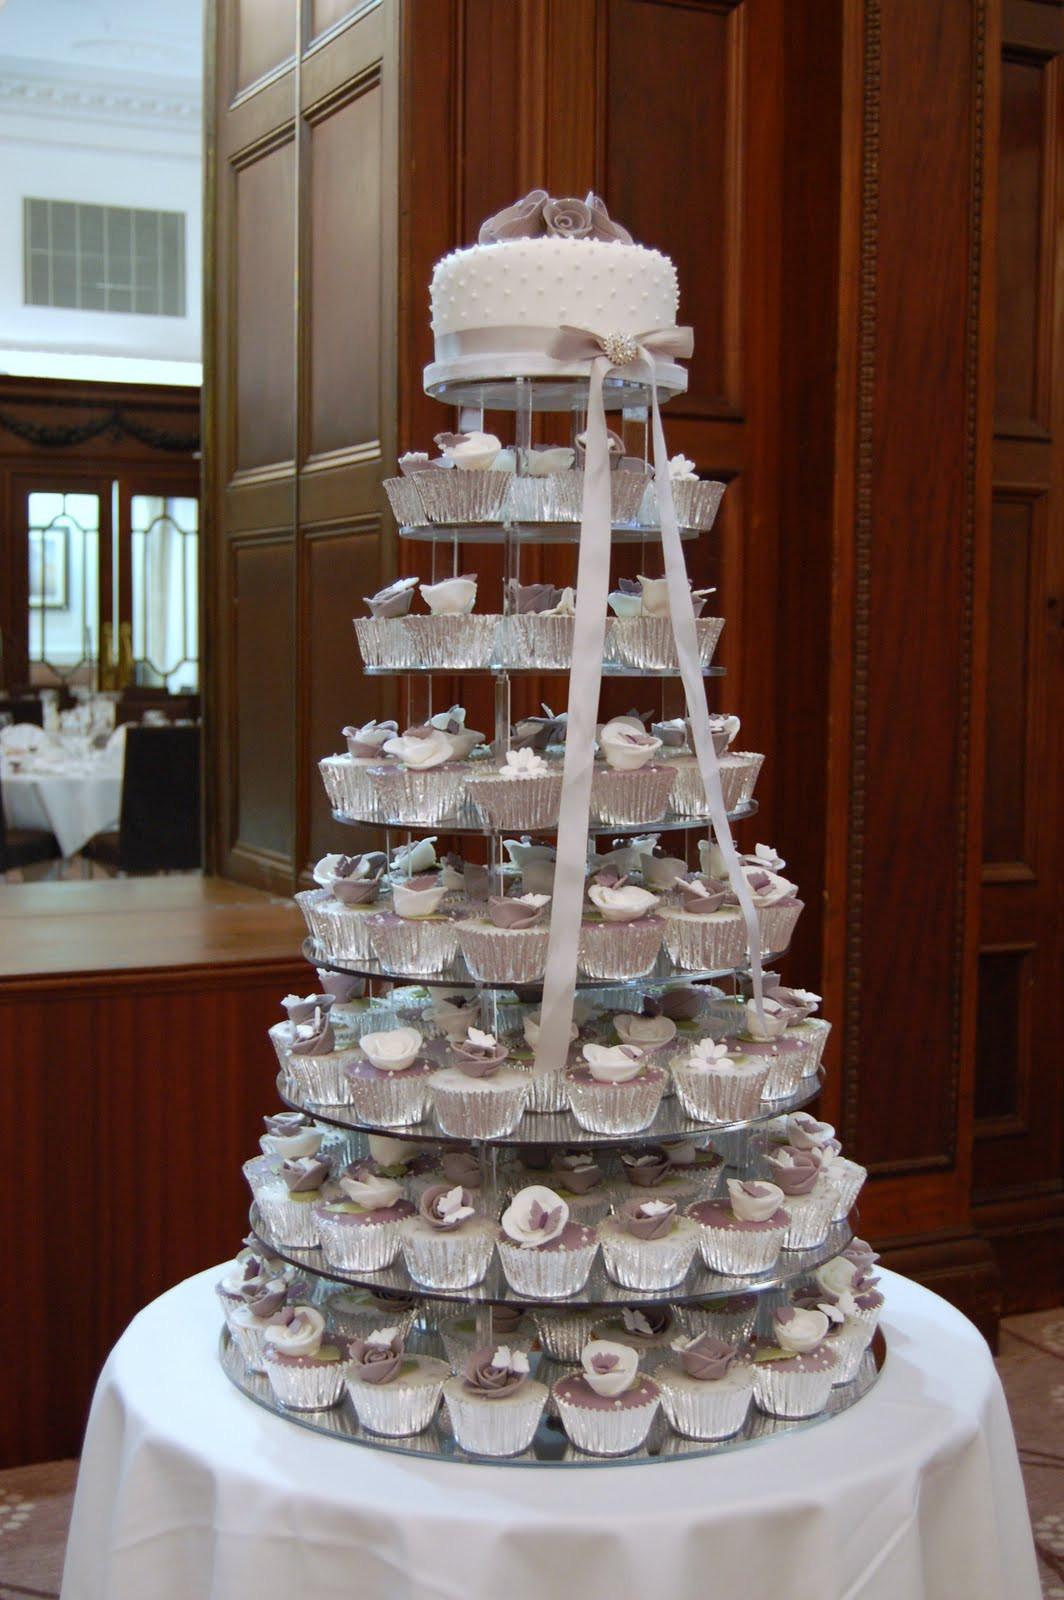 Cupcakes Wedding Cakes  iced Victorian Lilac Cupcake Wedding Cake